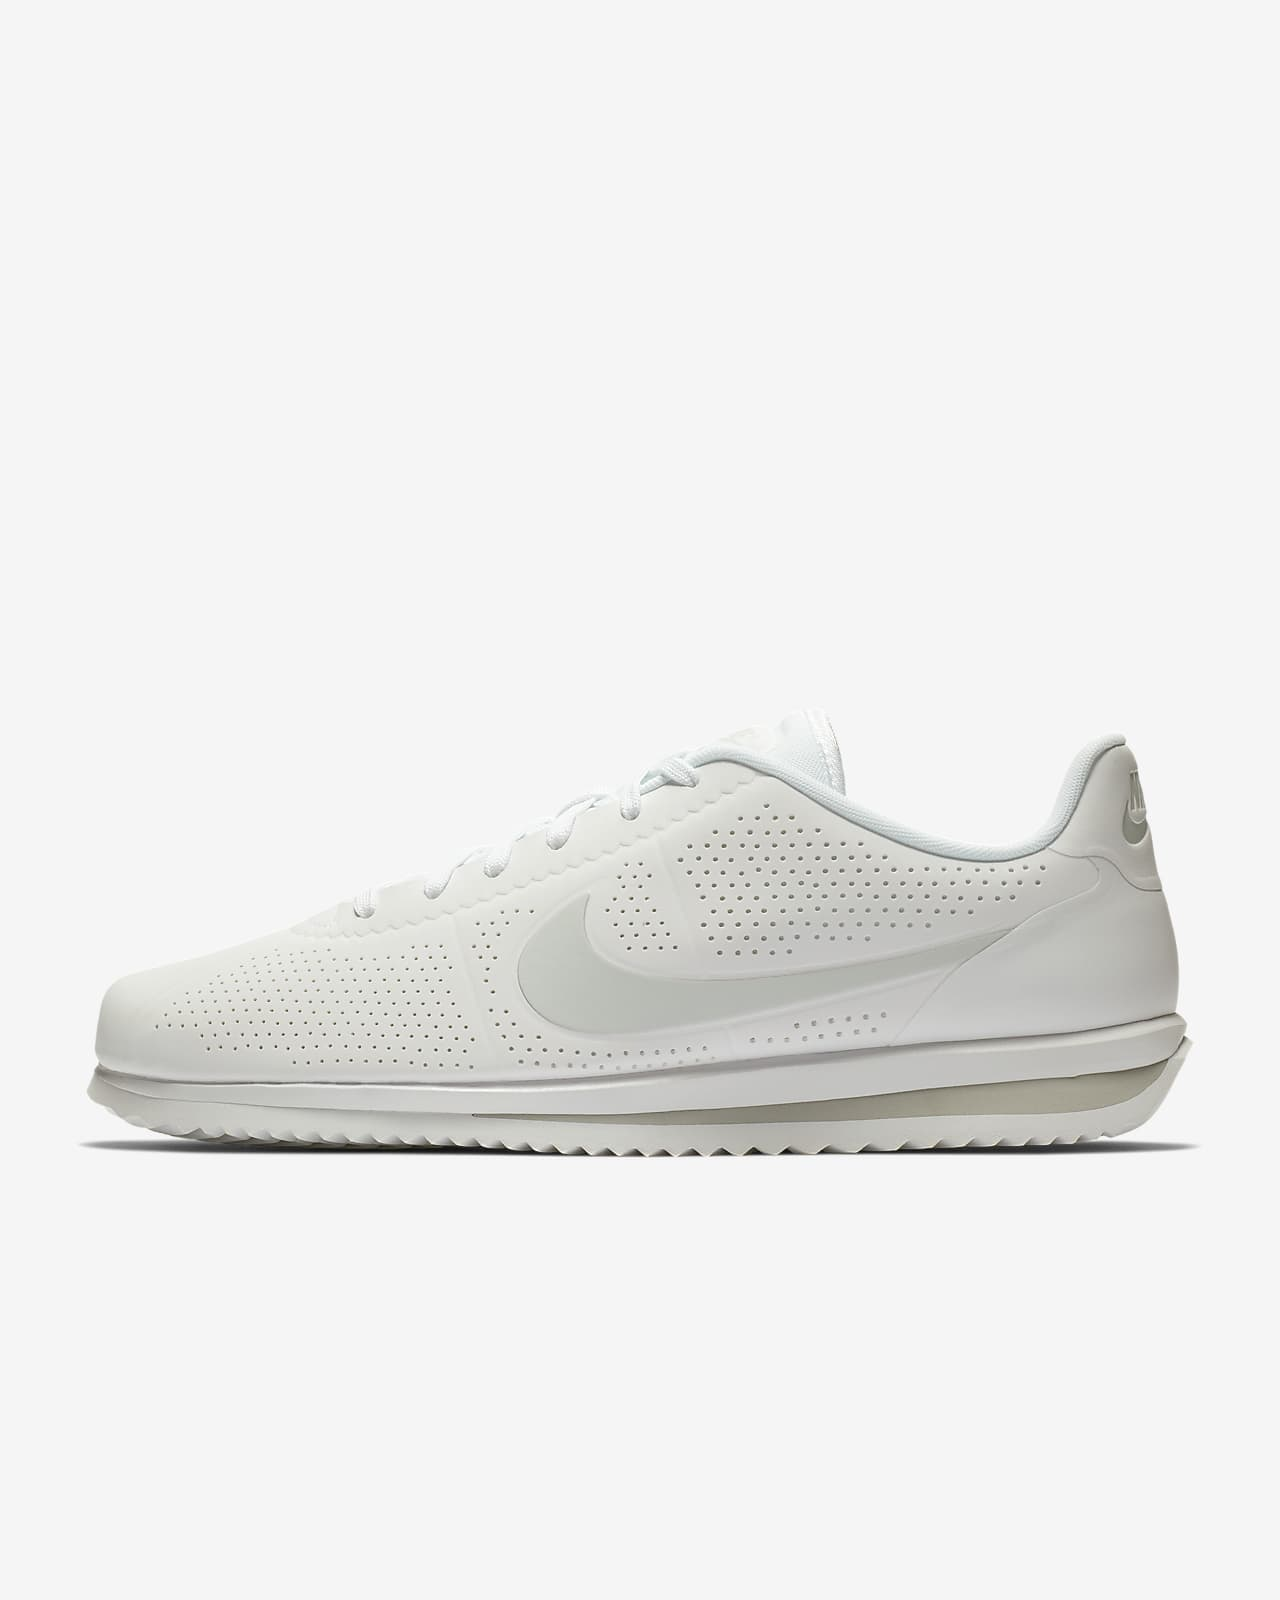 Chaussure Nike Cortez Ultra Moire pour Homme